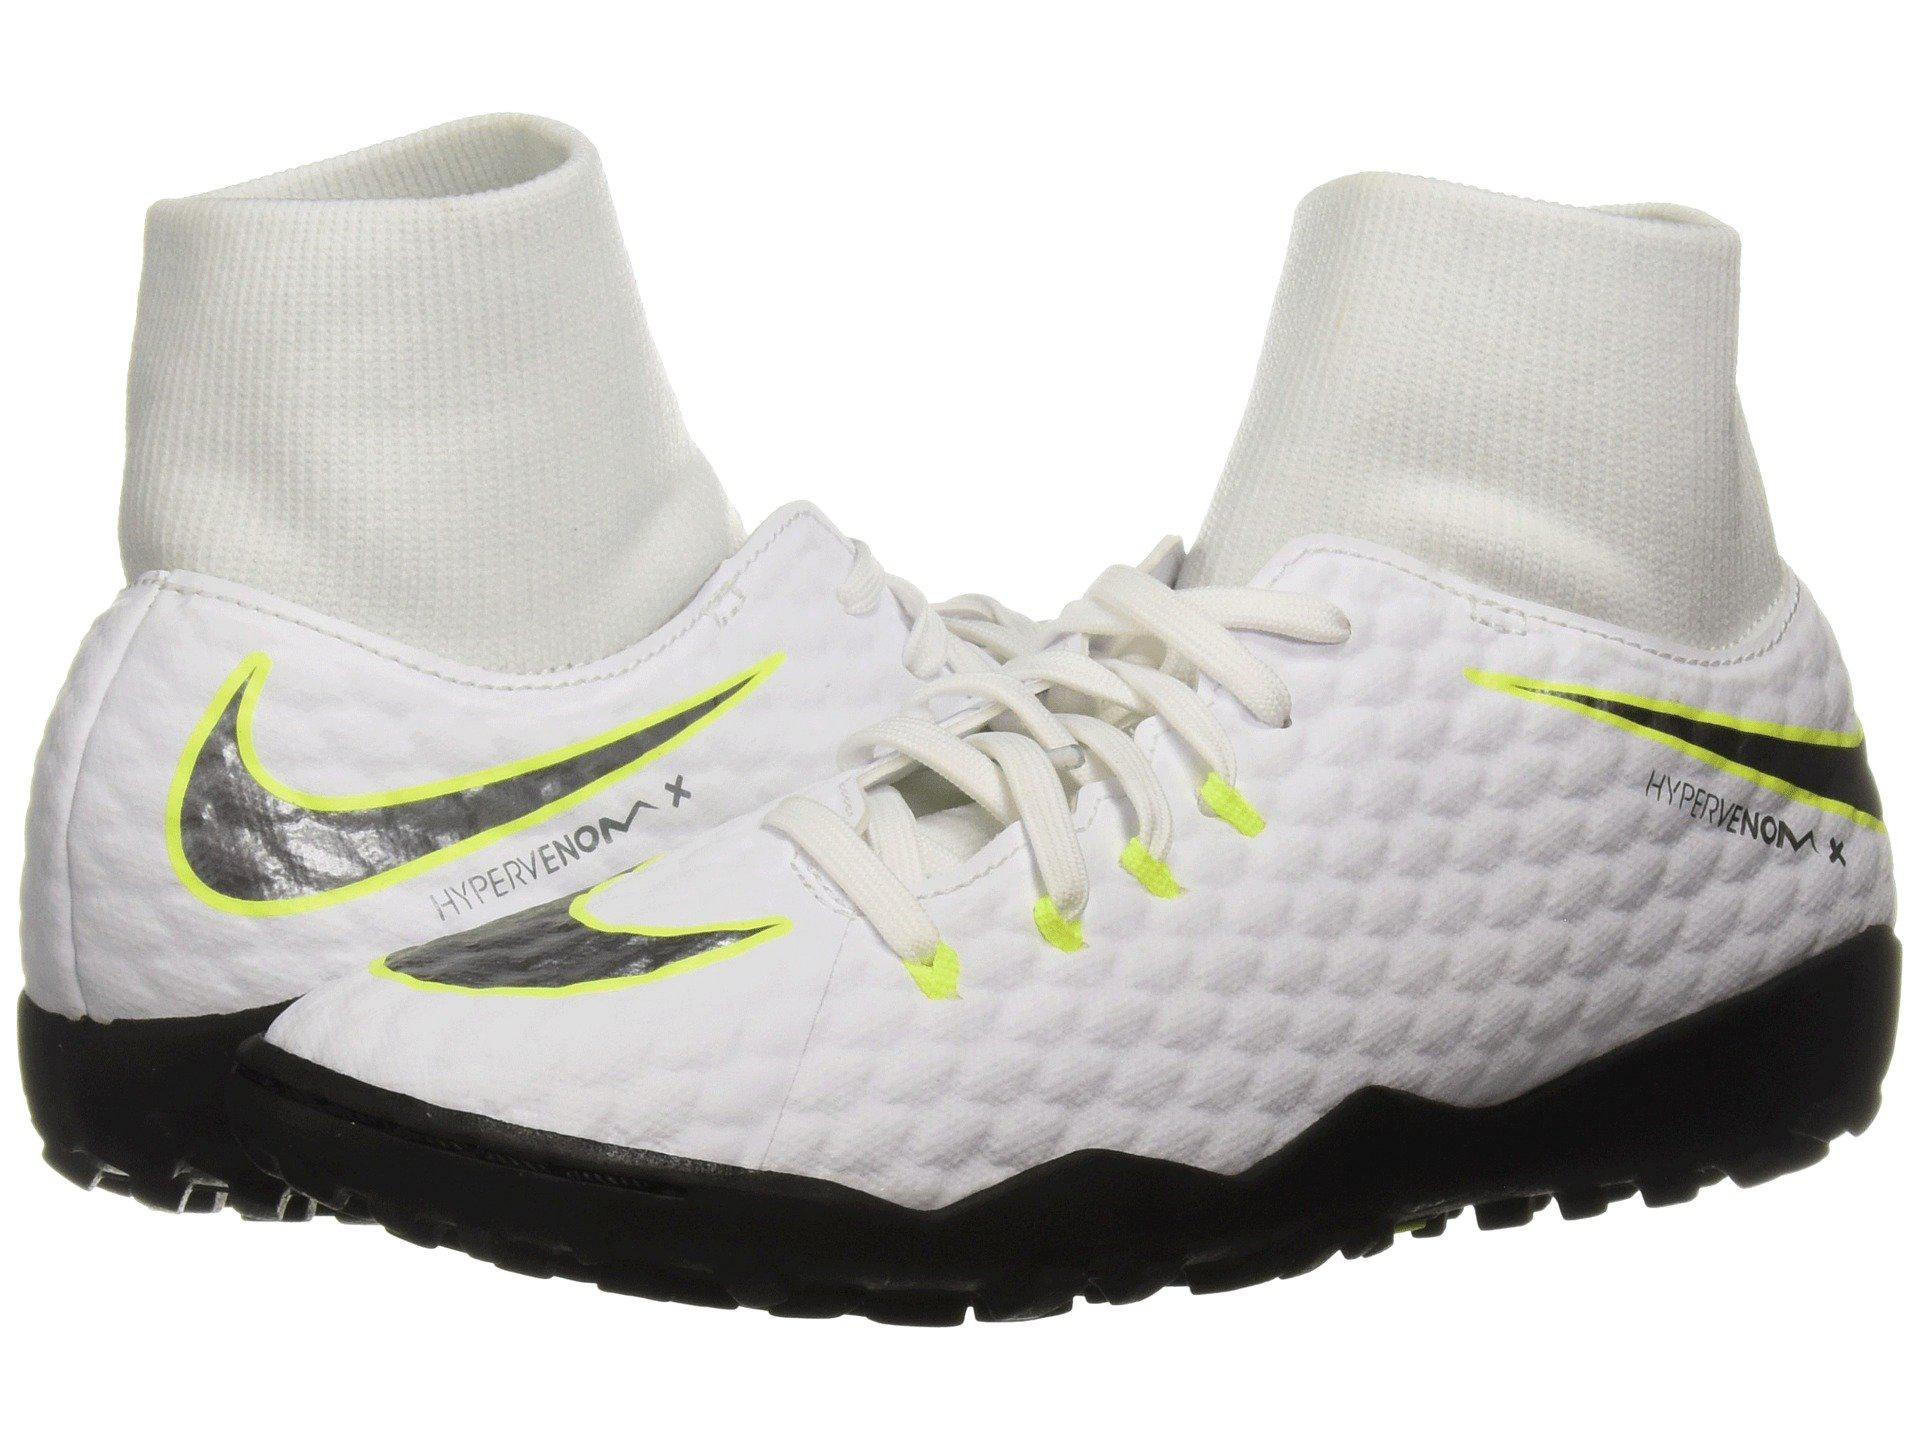 389fab370e Lyst - Nike Hypervenom Phantomx 3 Academy Dynamic Fit Tf in White ...